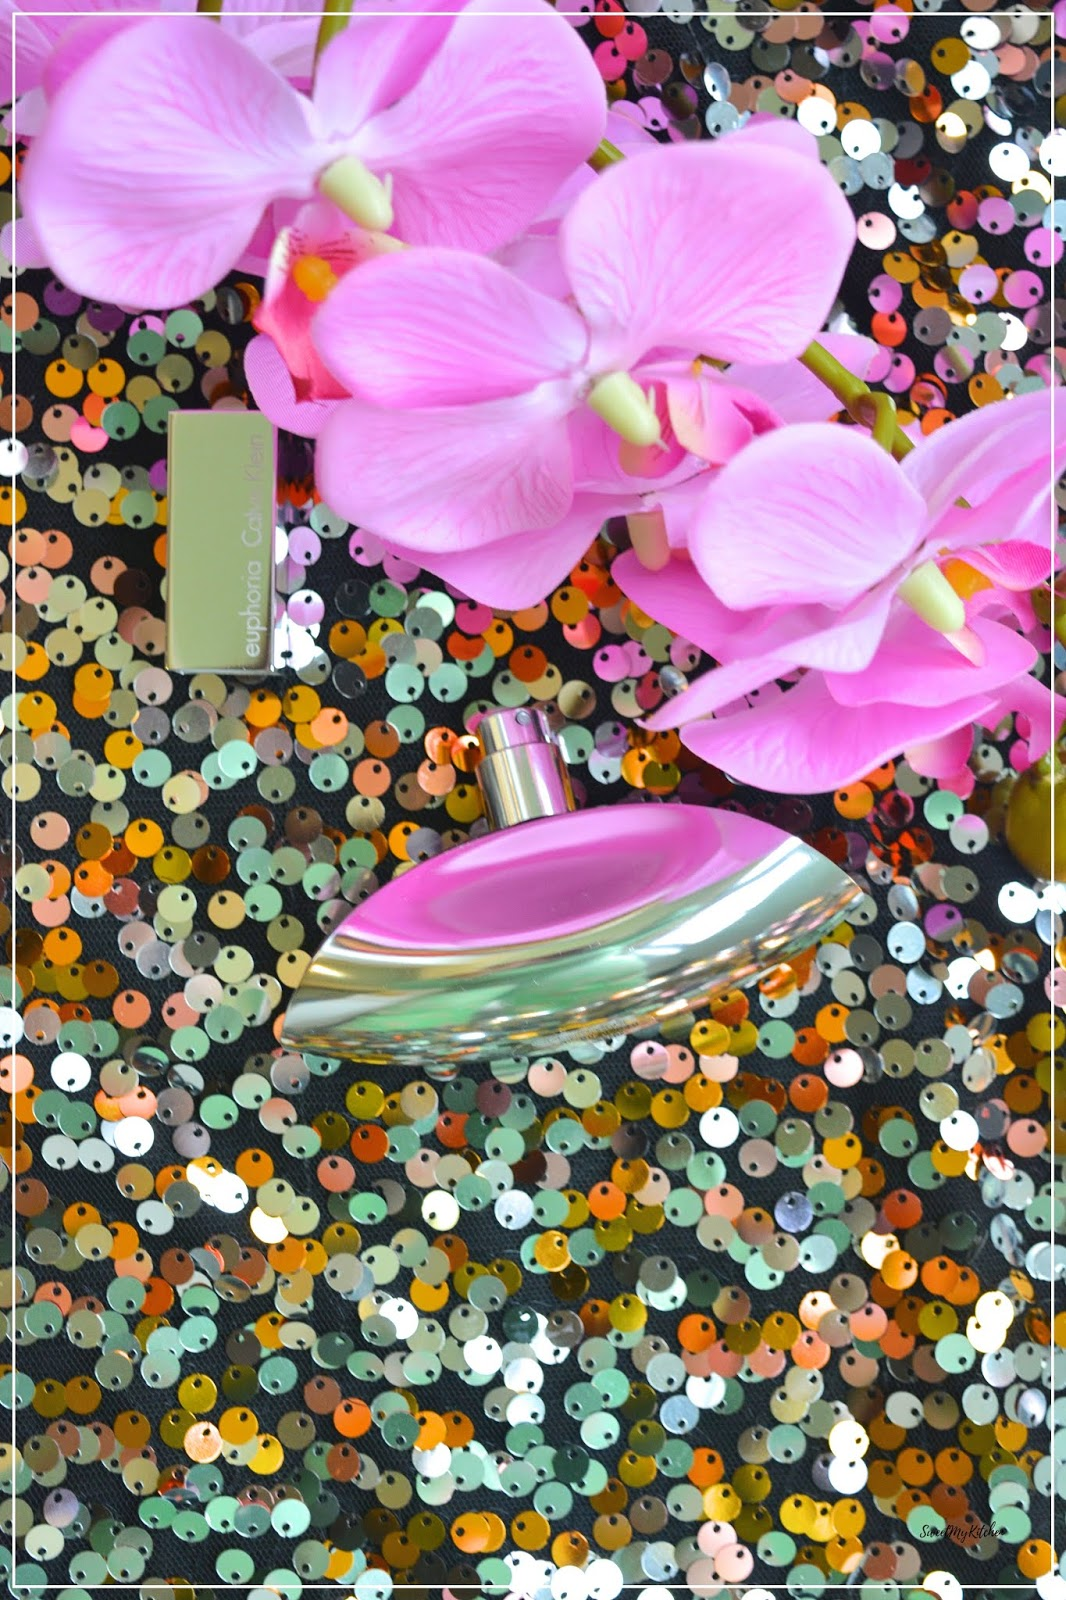 Calvin Klein Euphoria perfume bottle